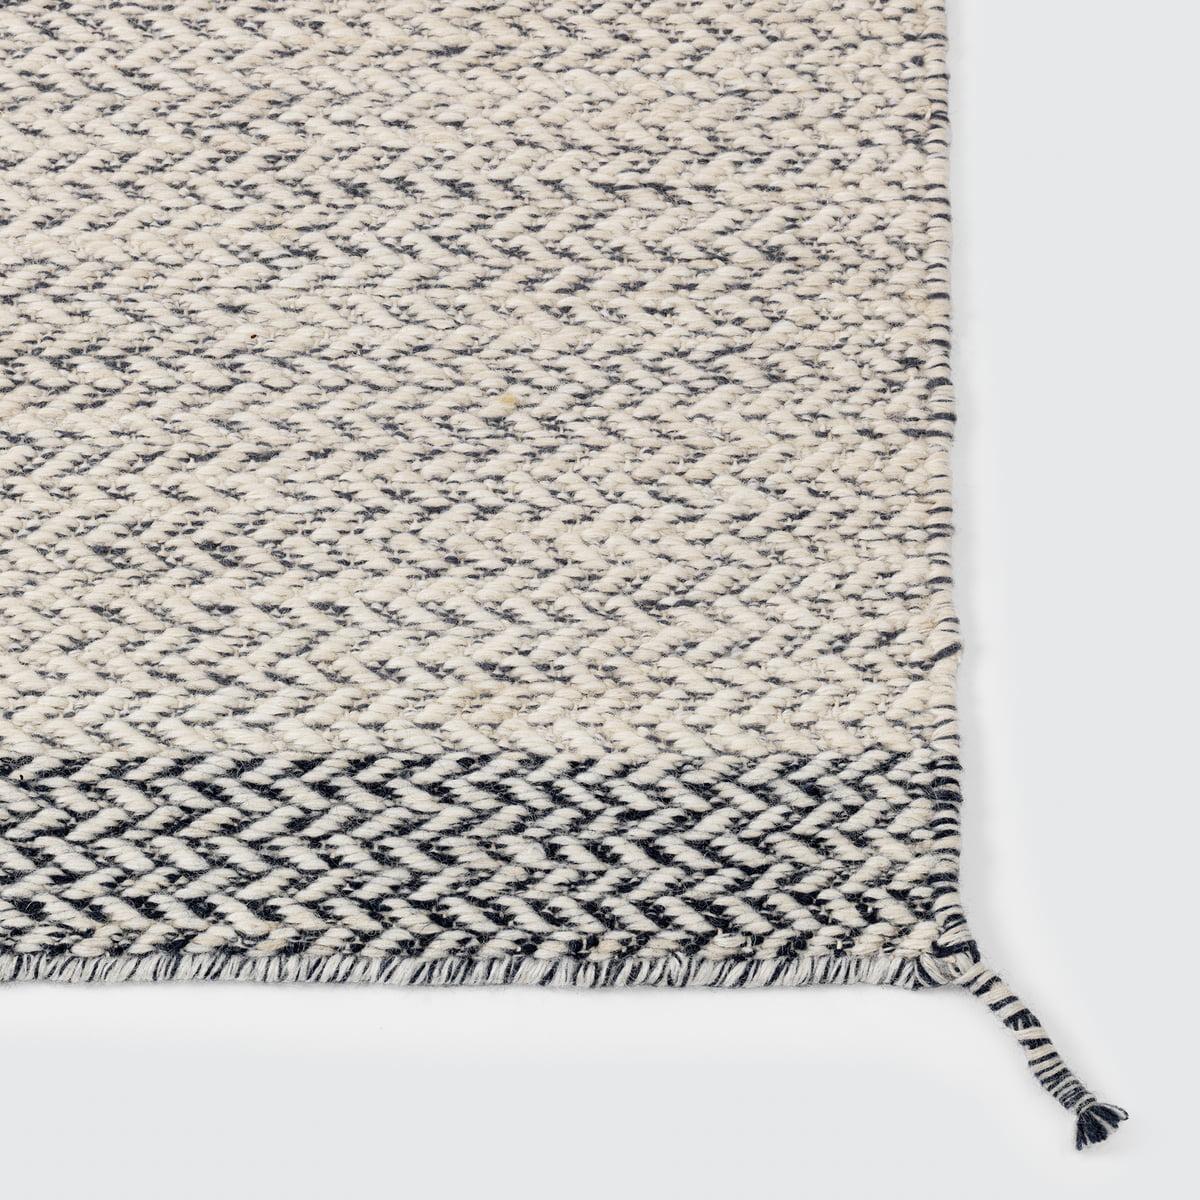 Skandinavischer Teppich skandinavischer teppich hausdesign pro